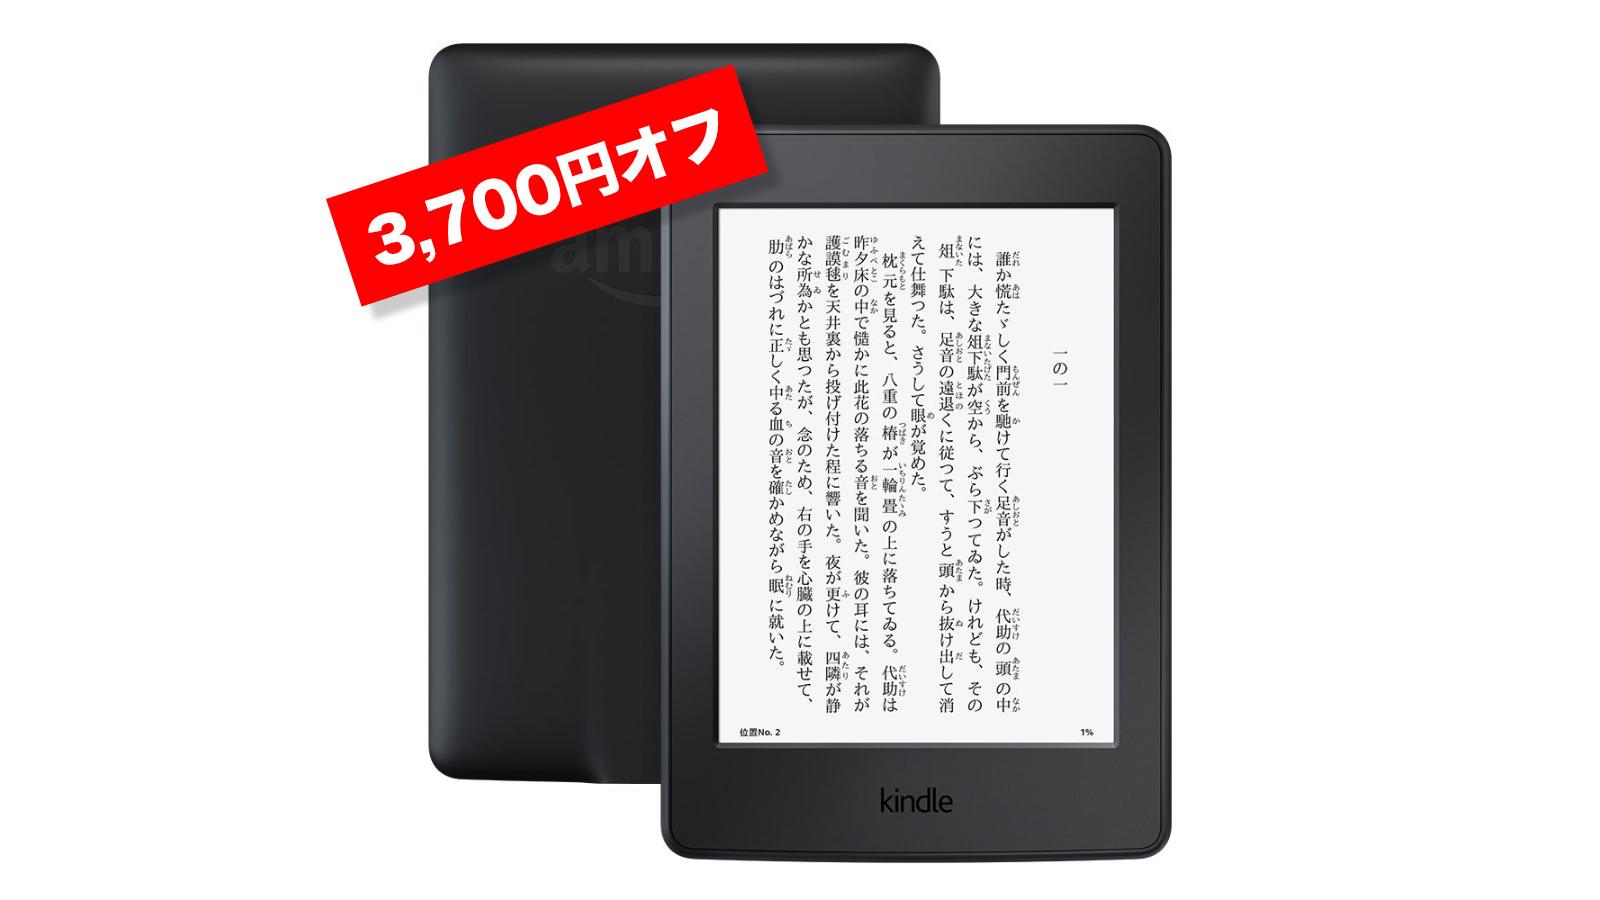 Kindle PaperWhite 3700yen off sale